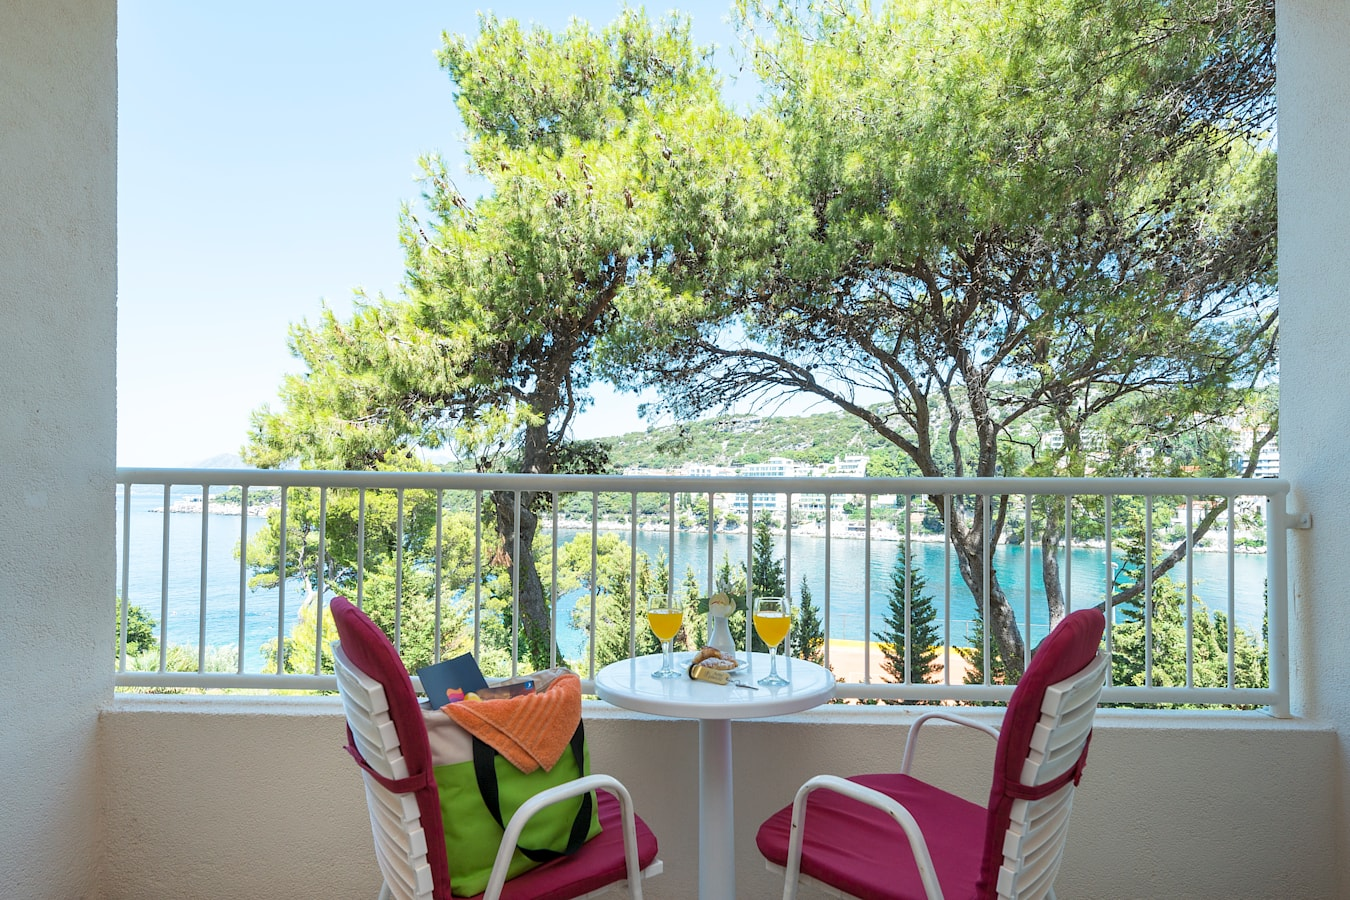 splendid-hotel-rooms-balcony-seaview.jpg